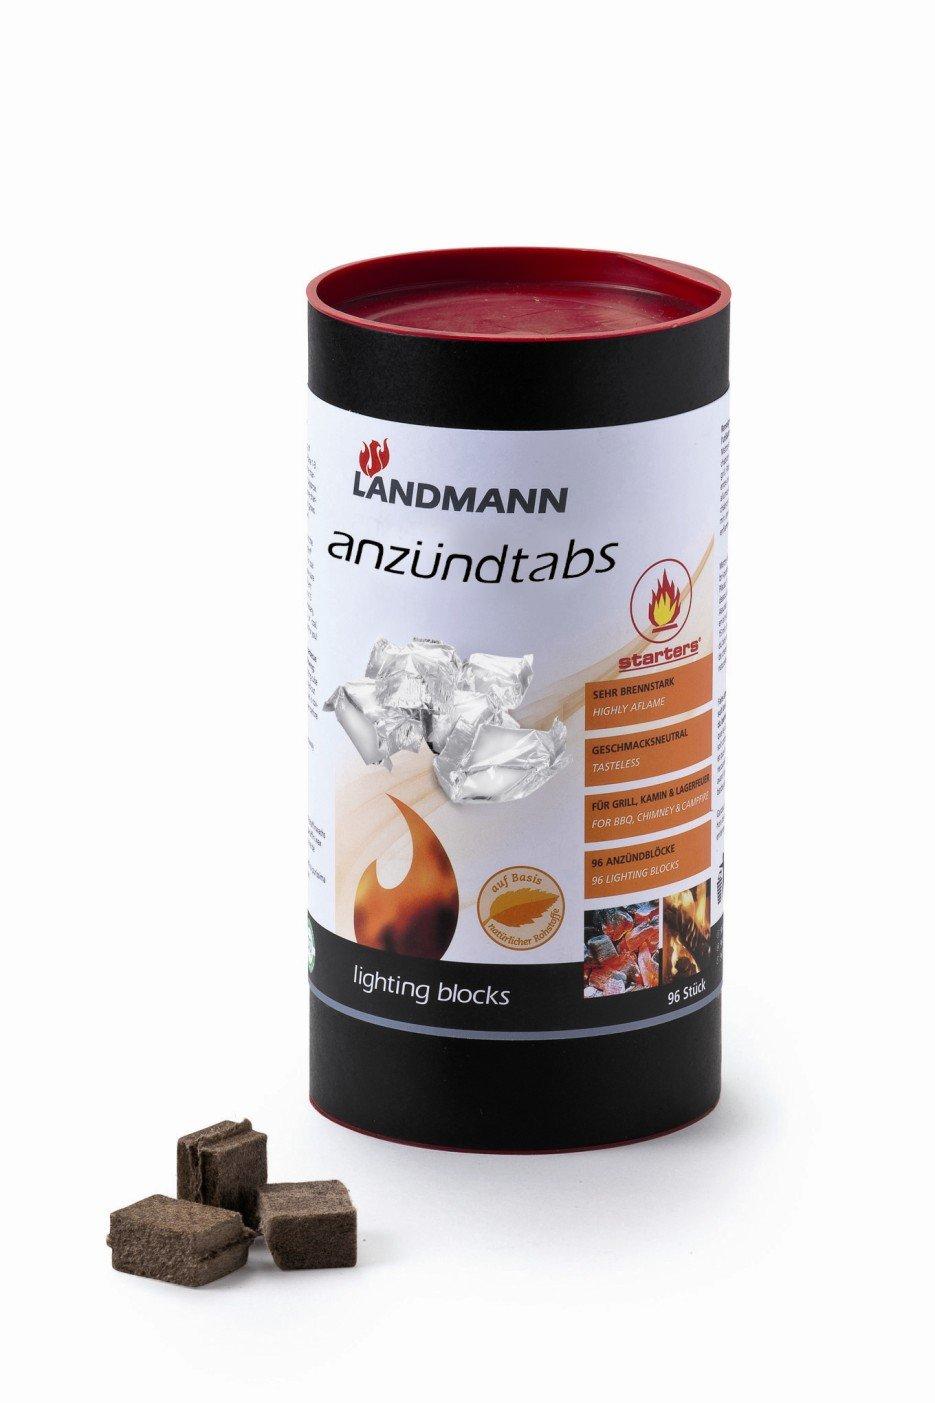 Landmann 13806 - barbecue/grill accessories